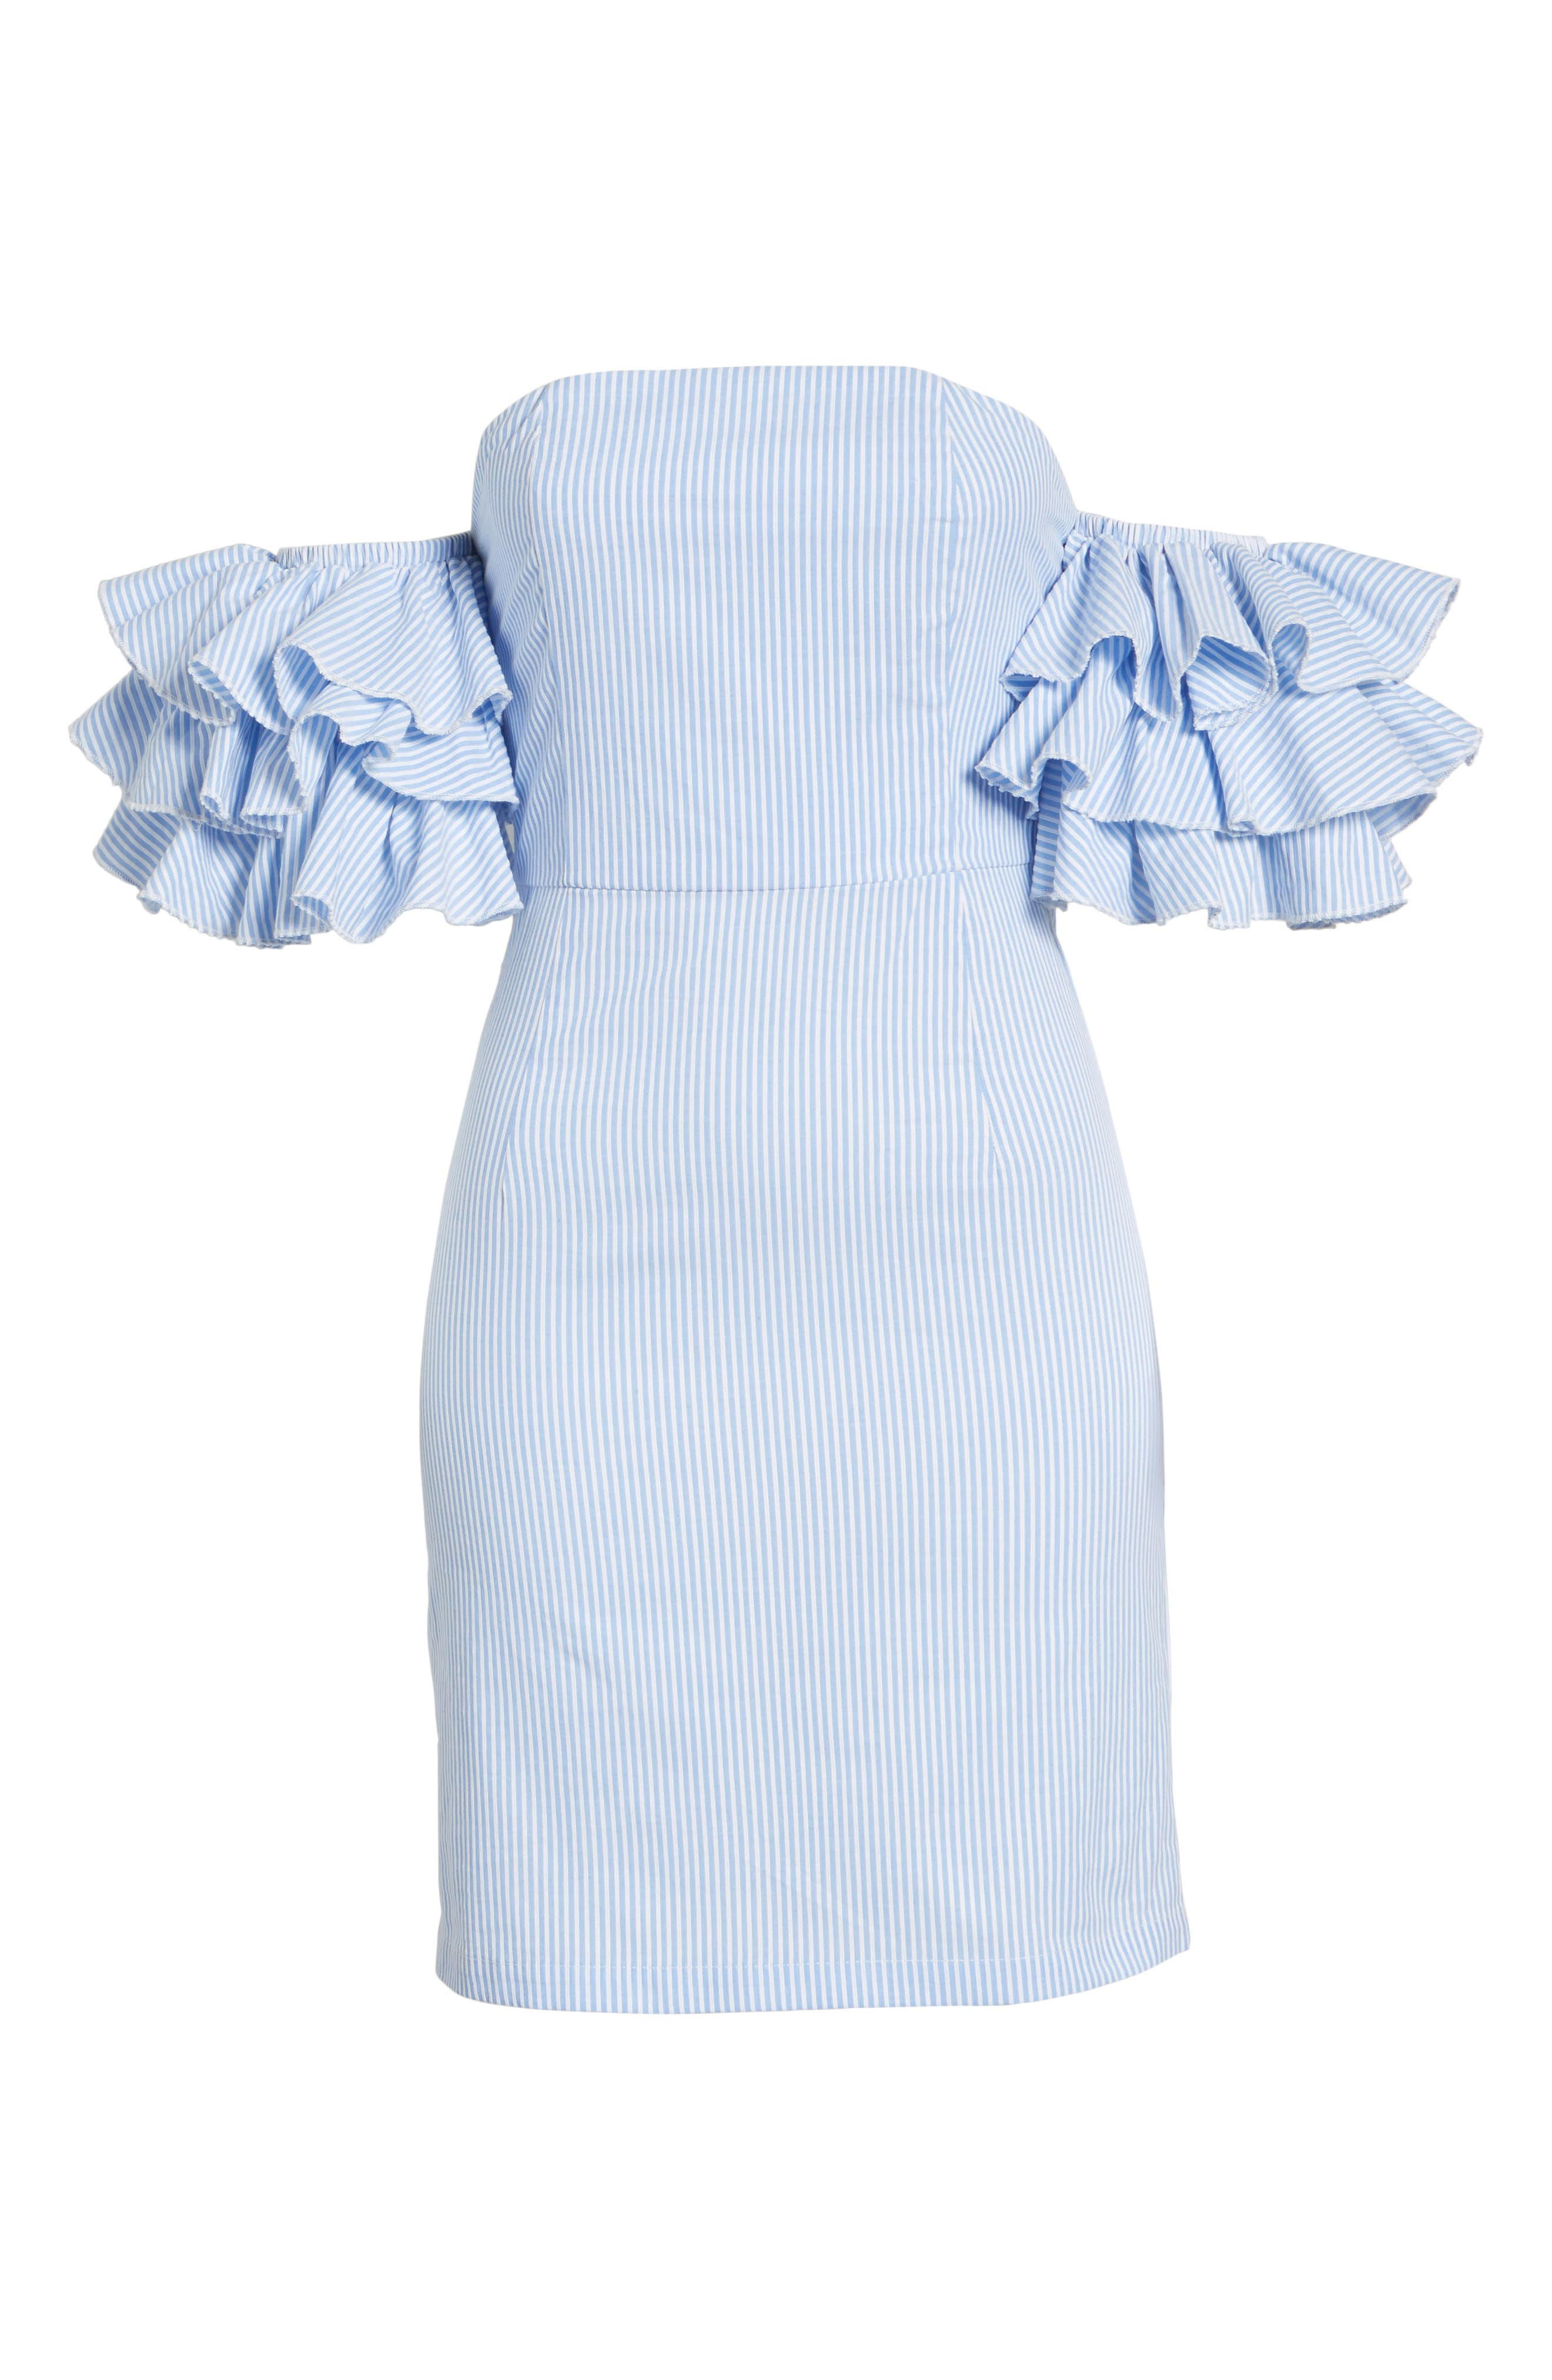 The Malibu Off the Shoulder Dress,                             Alternate thumbnail 6, color,                             420